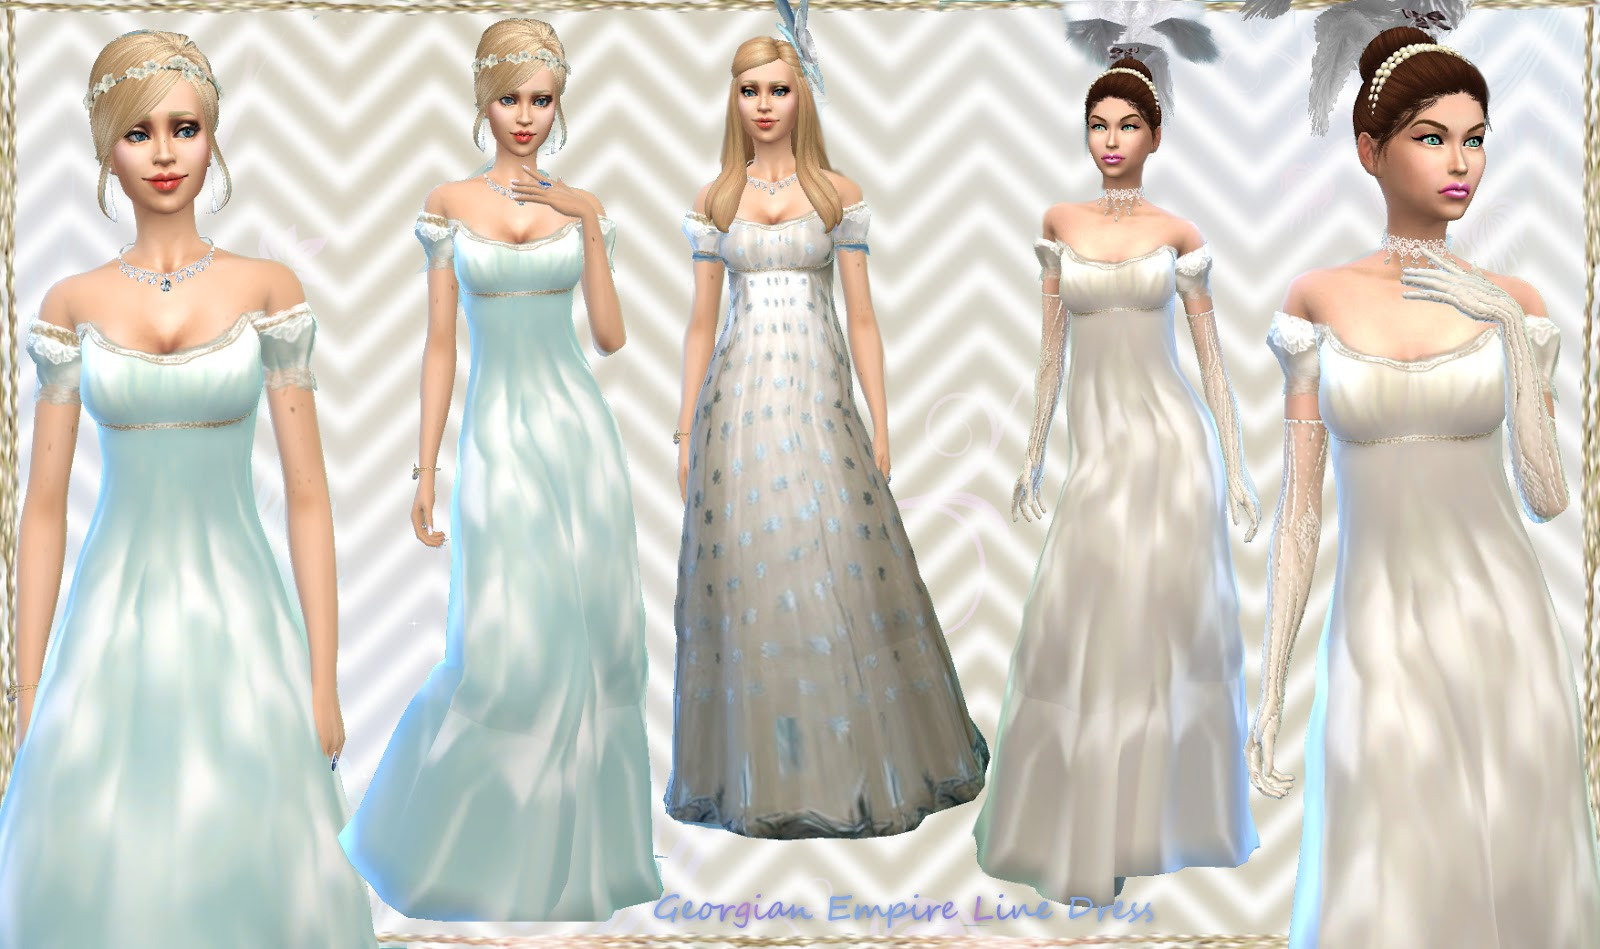 Mythical Dreams Sims 4